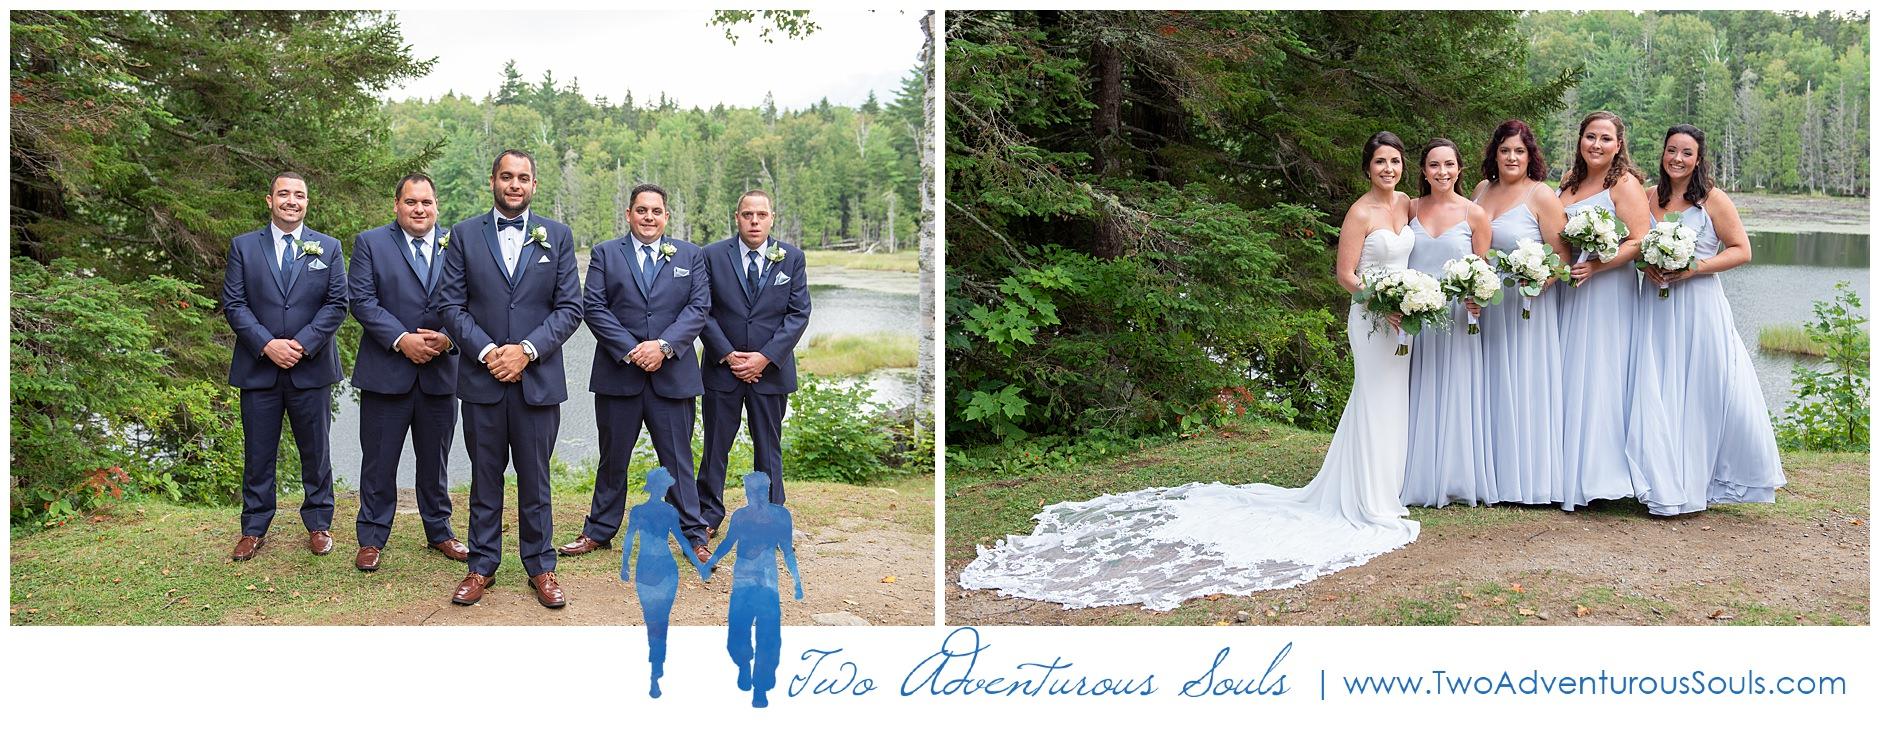 Sugarloaf Outdoor Center Wedding Photographers, Destination Wedding Photographers, Two Adventurous Souls-081719_0027.jpg